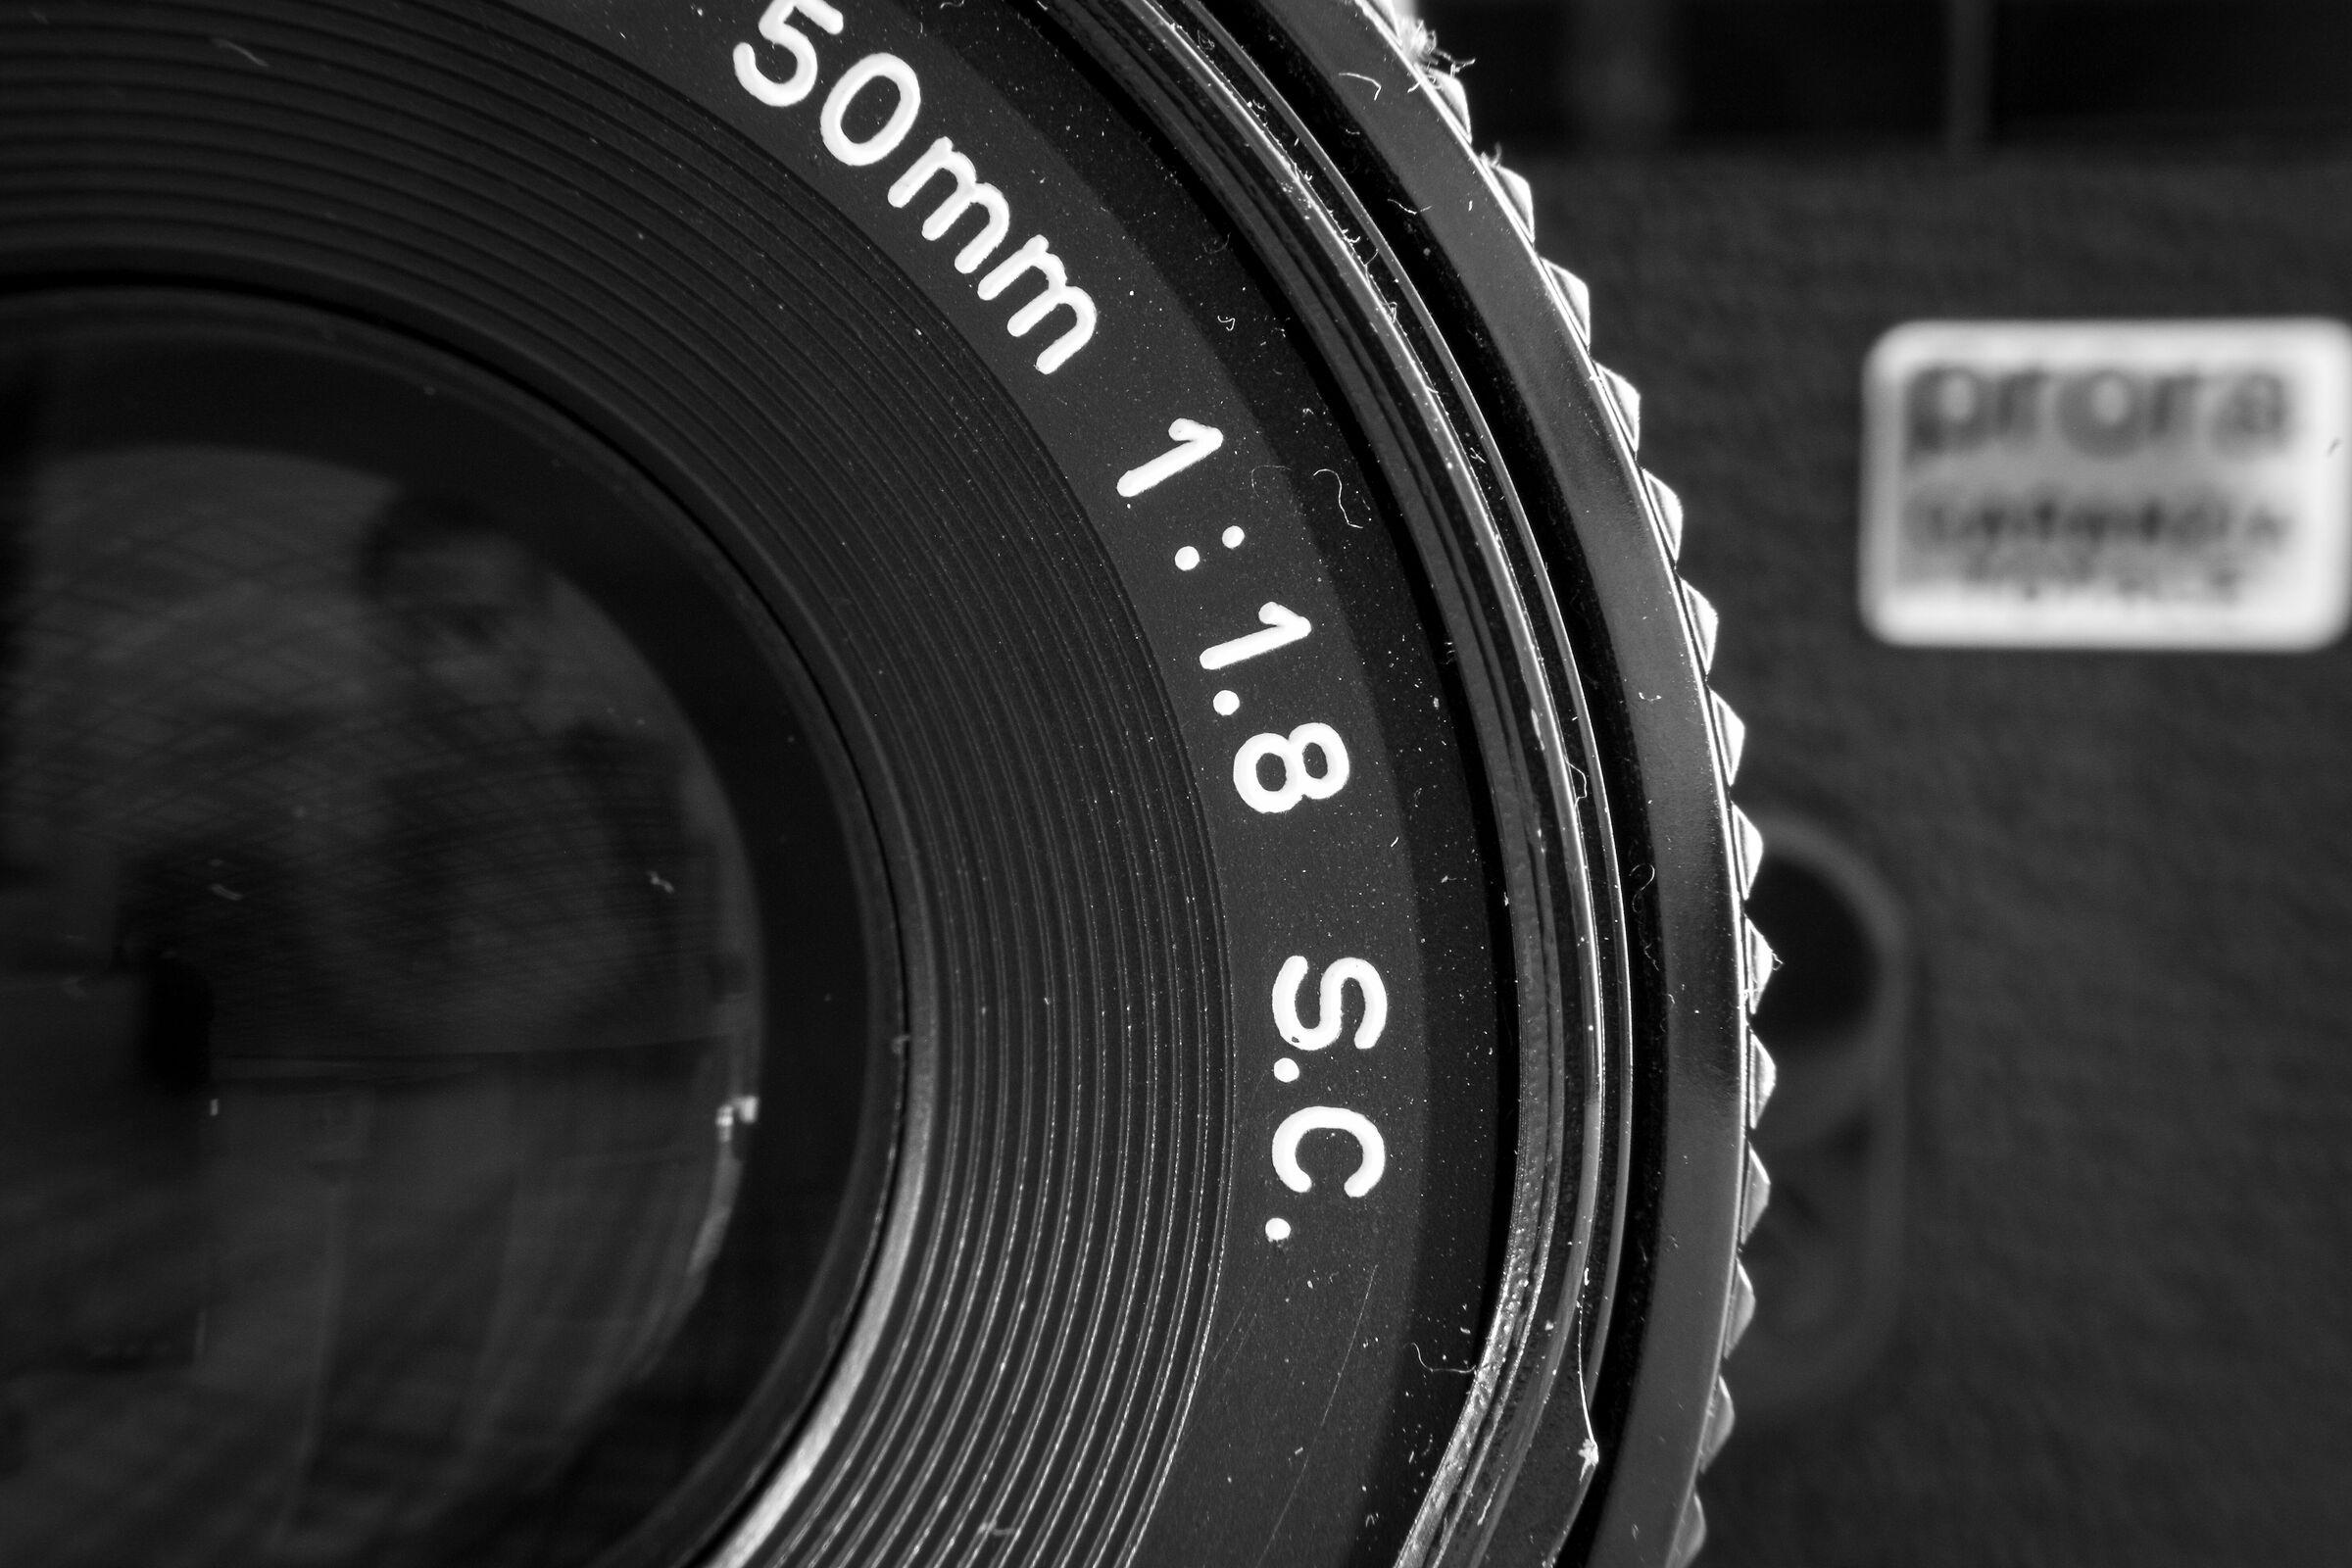 Canon FTb...